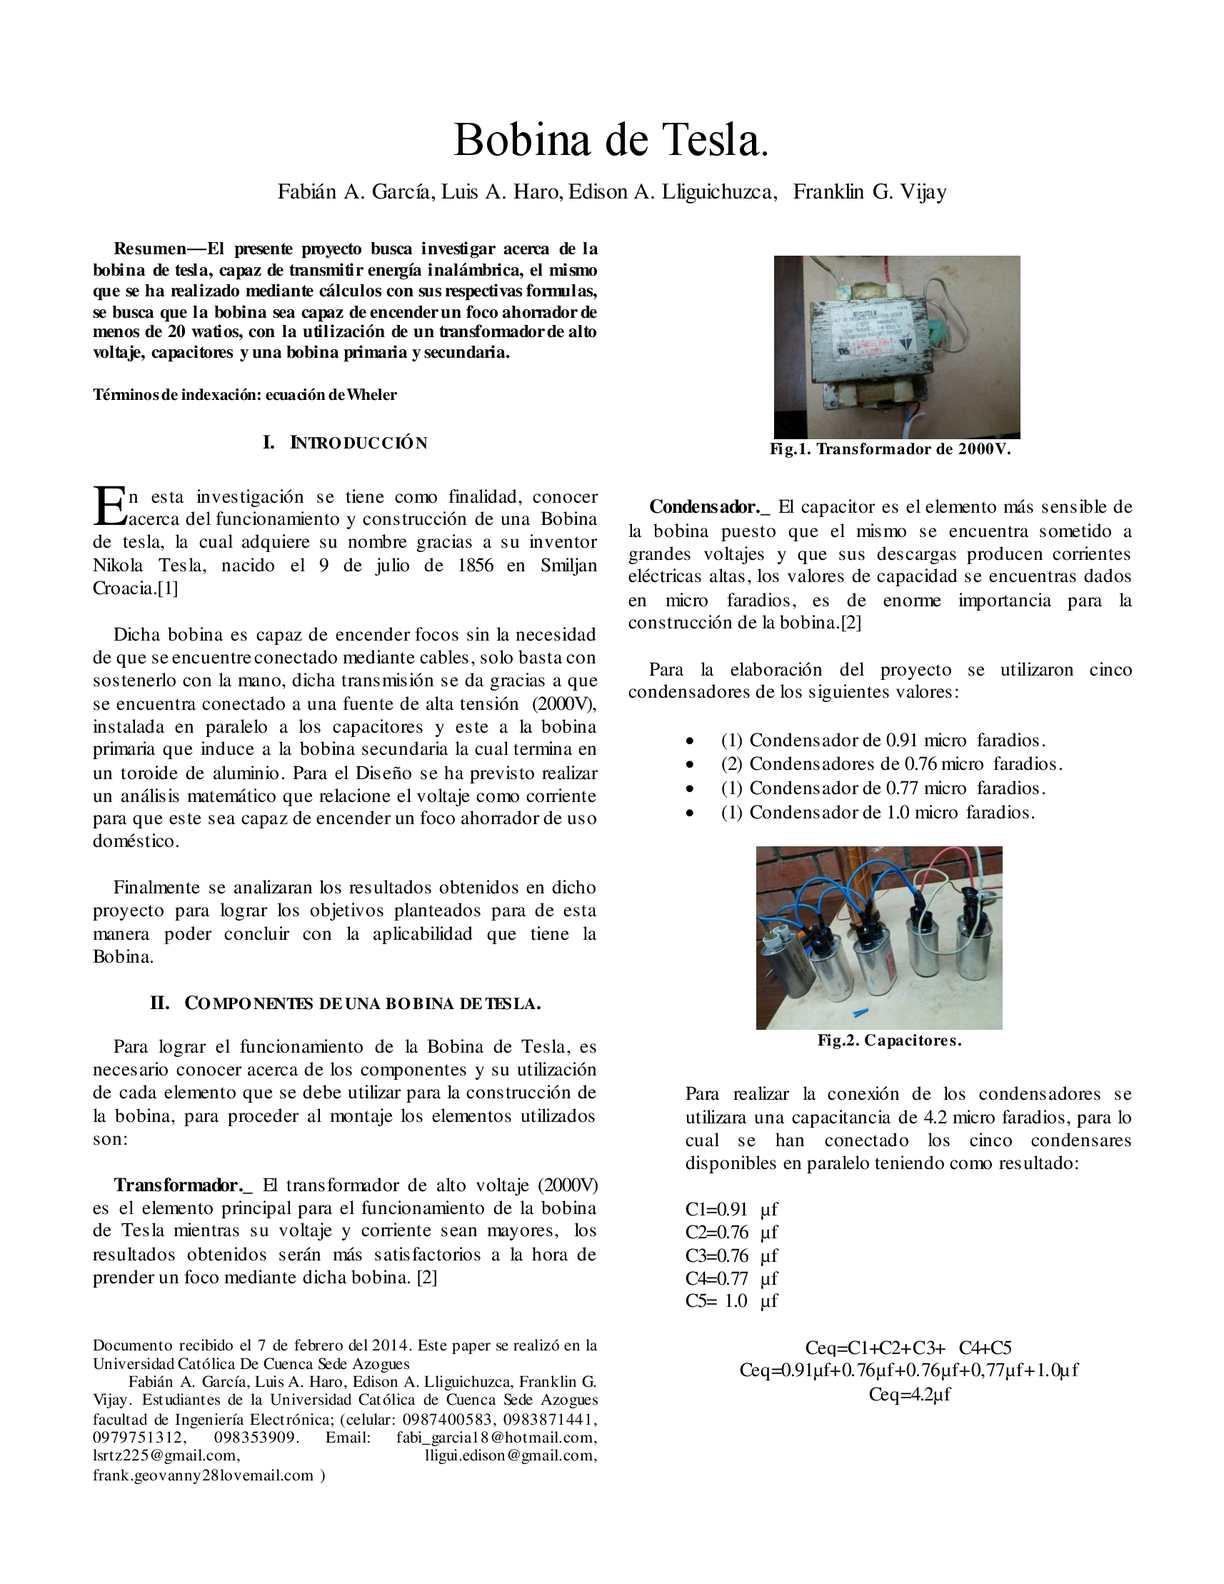 Circuito Bobina De Tesla : Elaboración de una bobina de tesla calameo downloader